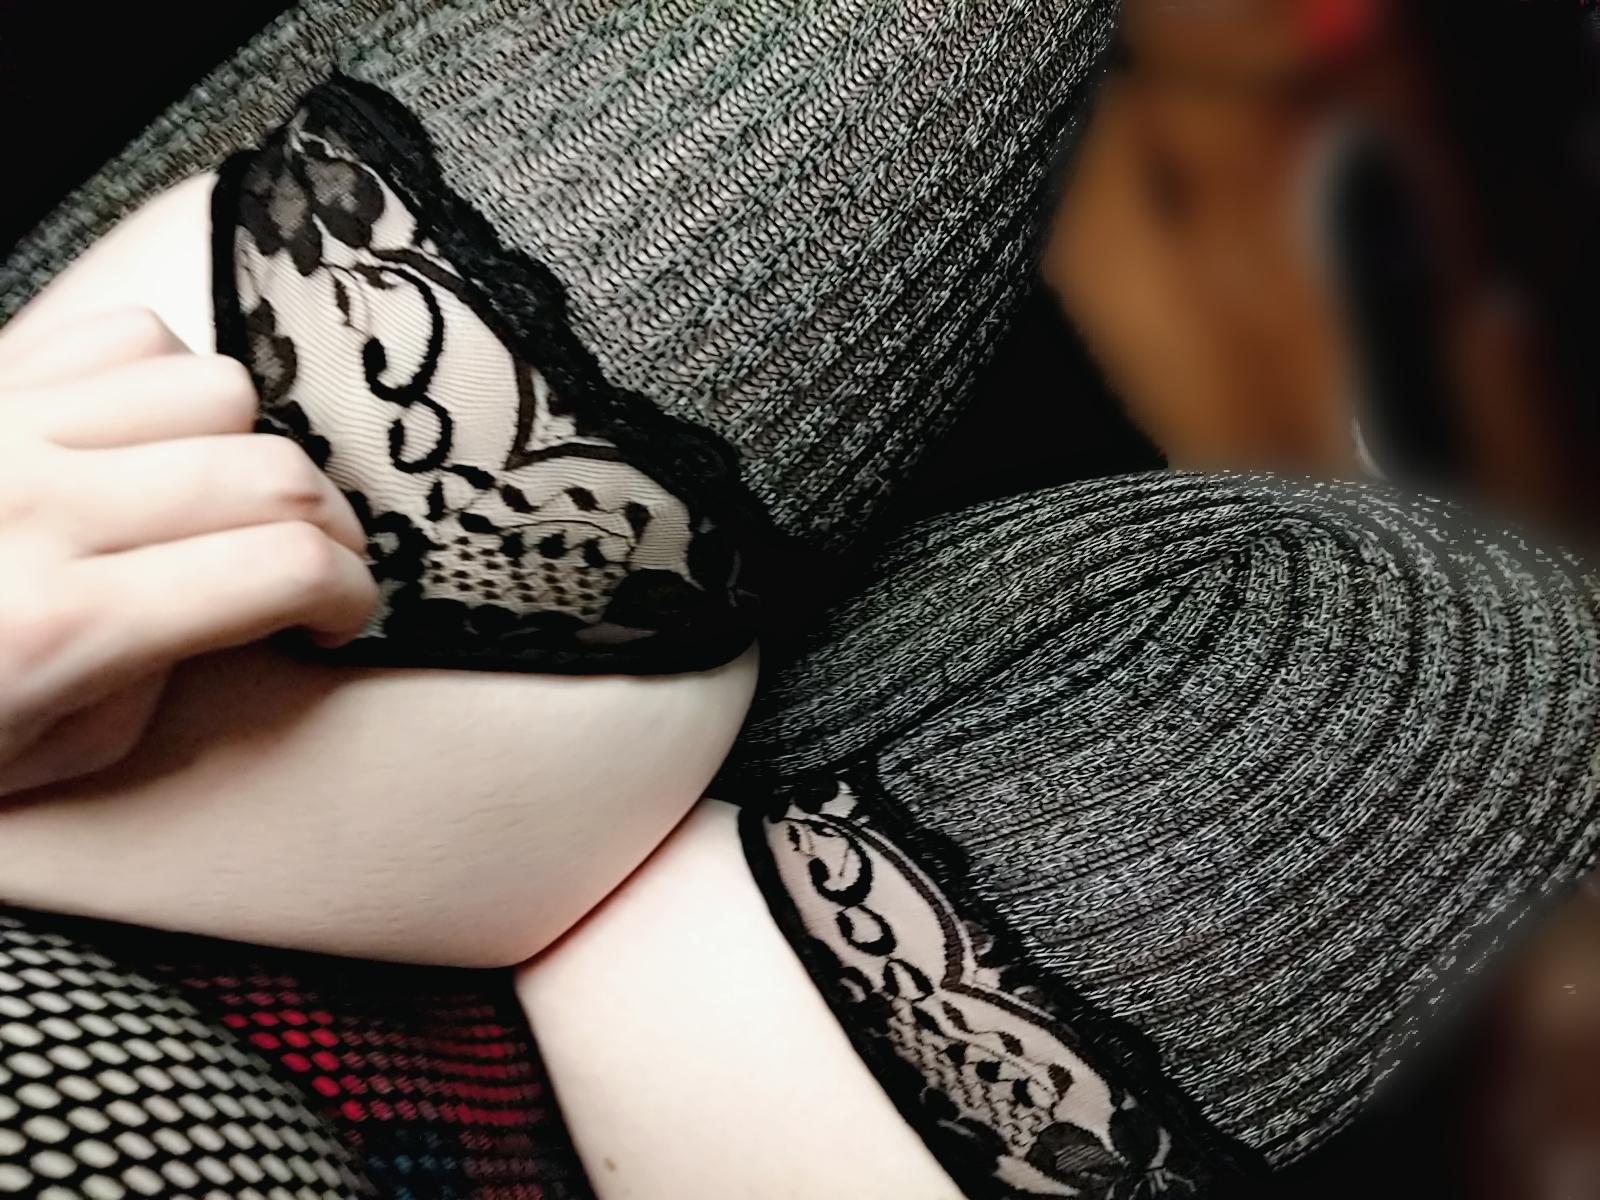 Poofychan's Slutty Goth E Girl Cosplay 0055